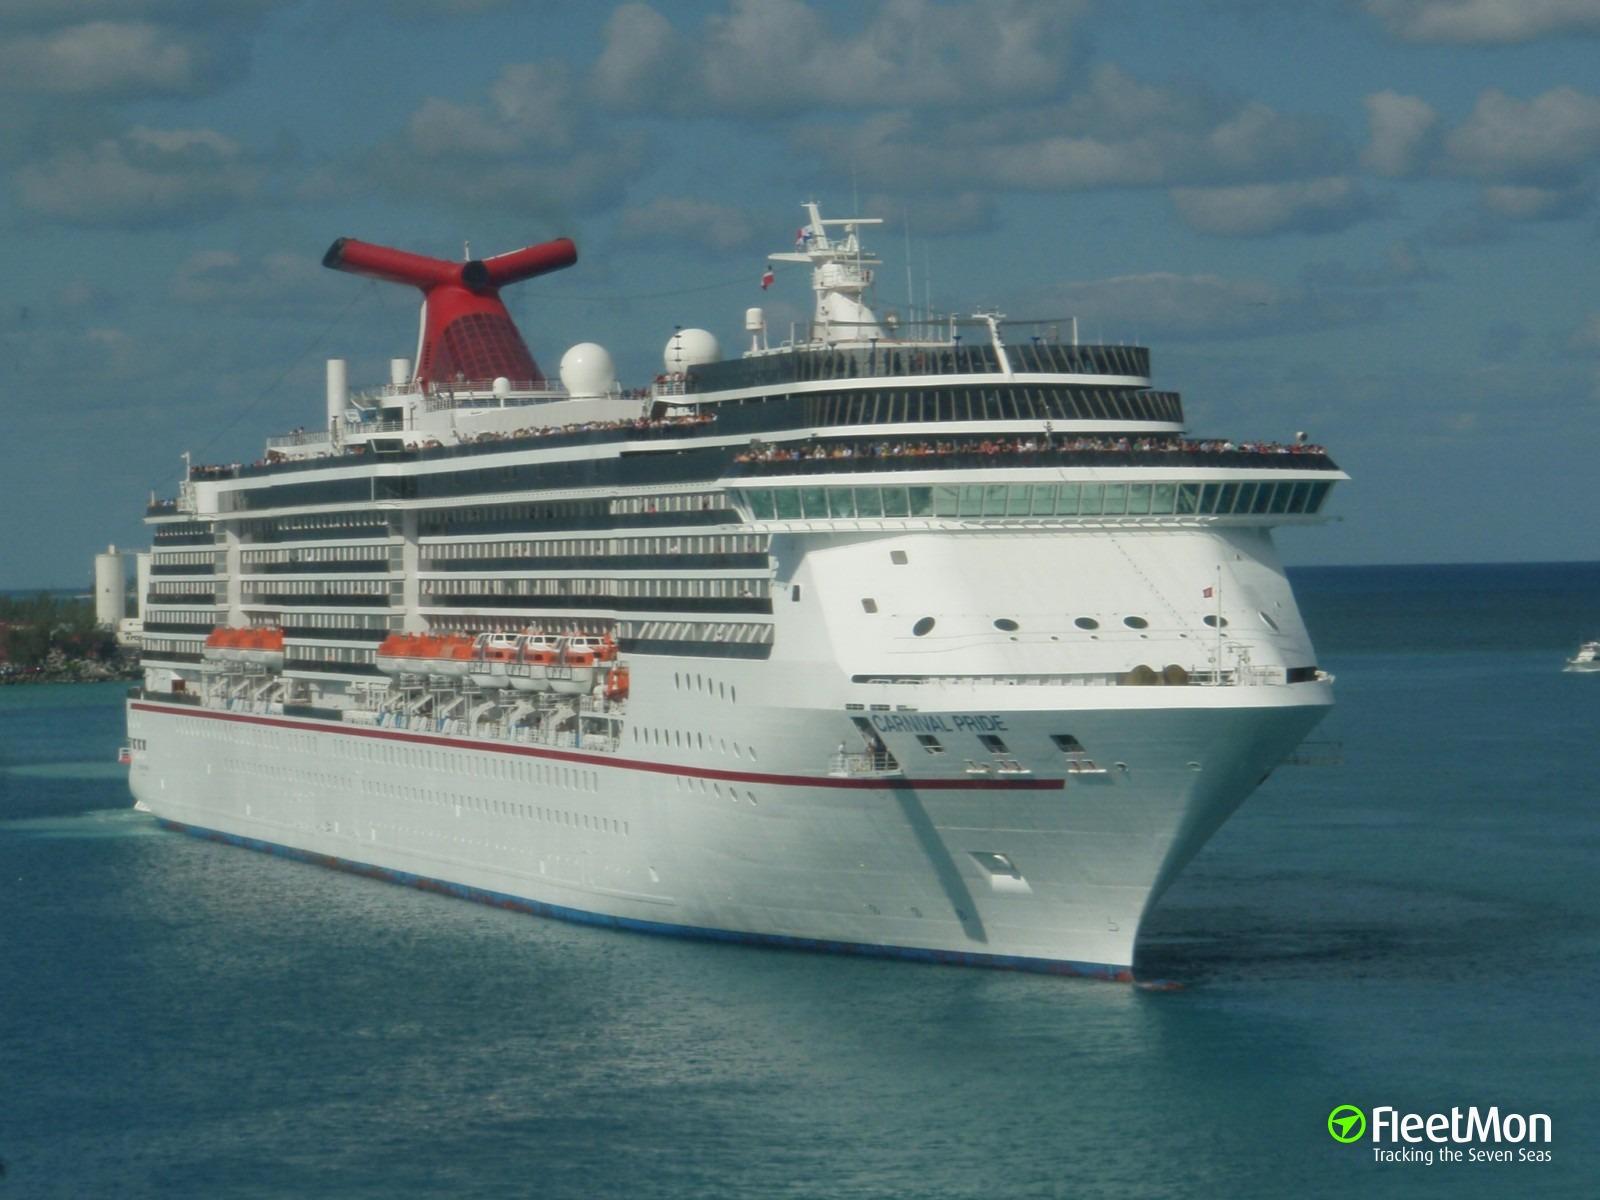 Cruise ship Carnival Pride struck passenger gangway in Baltimore